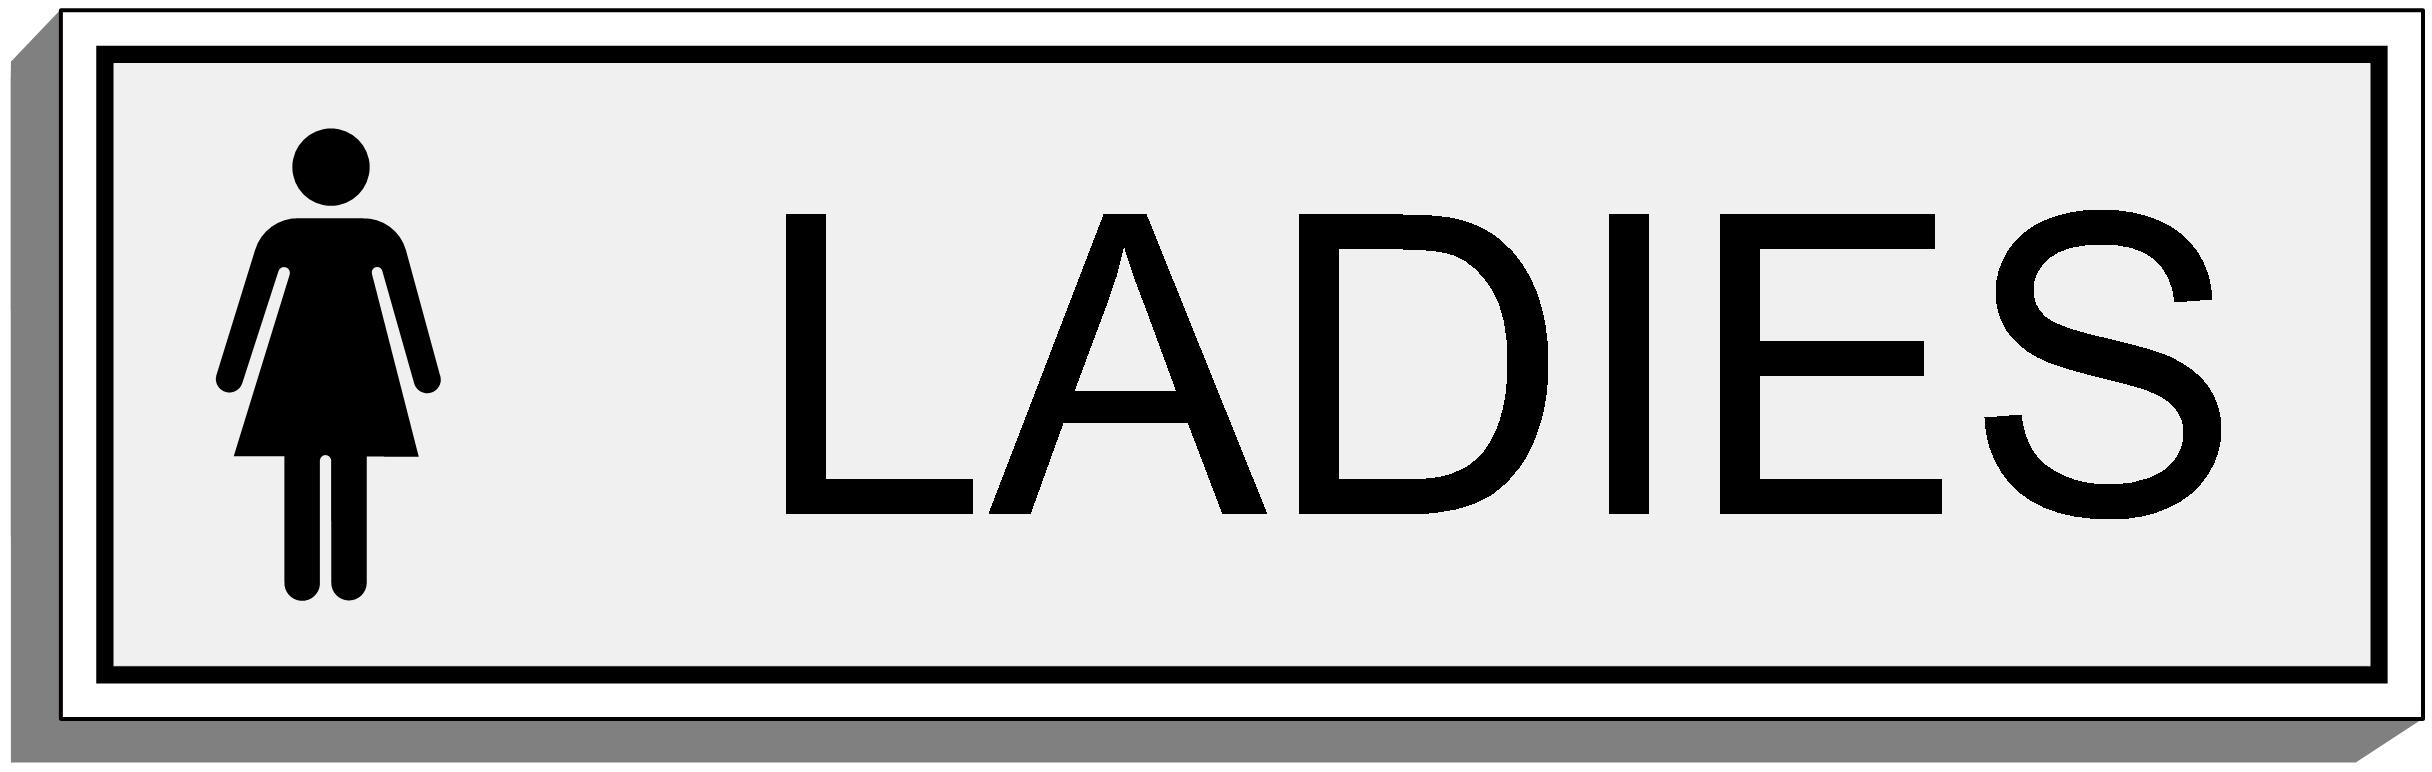 Ladies toilet clipart best for Ladies bathroom sign